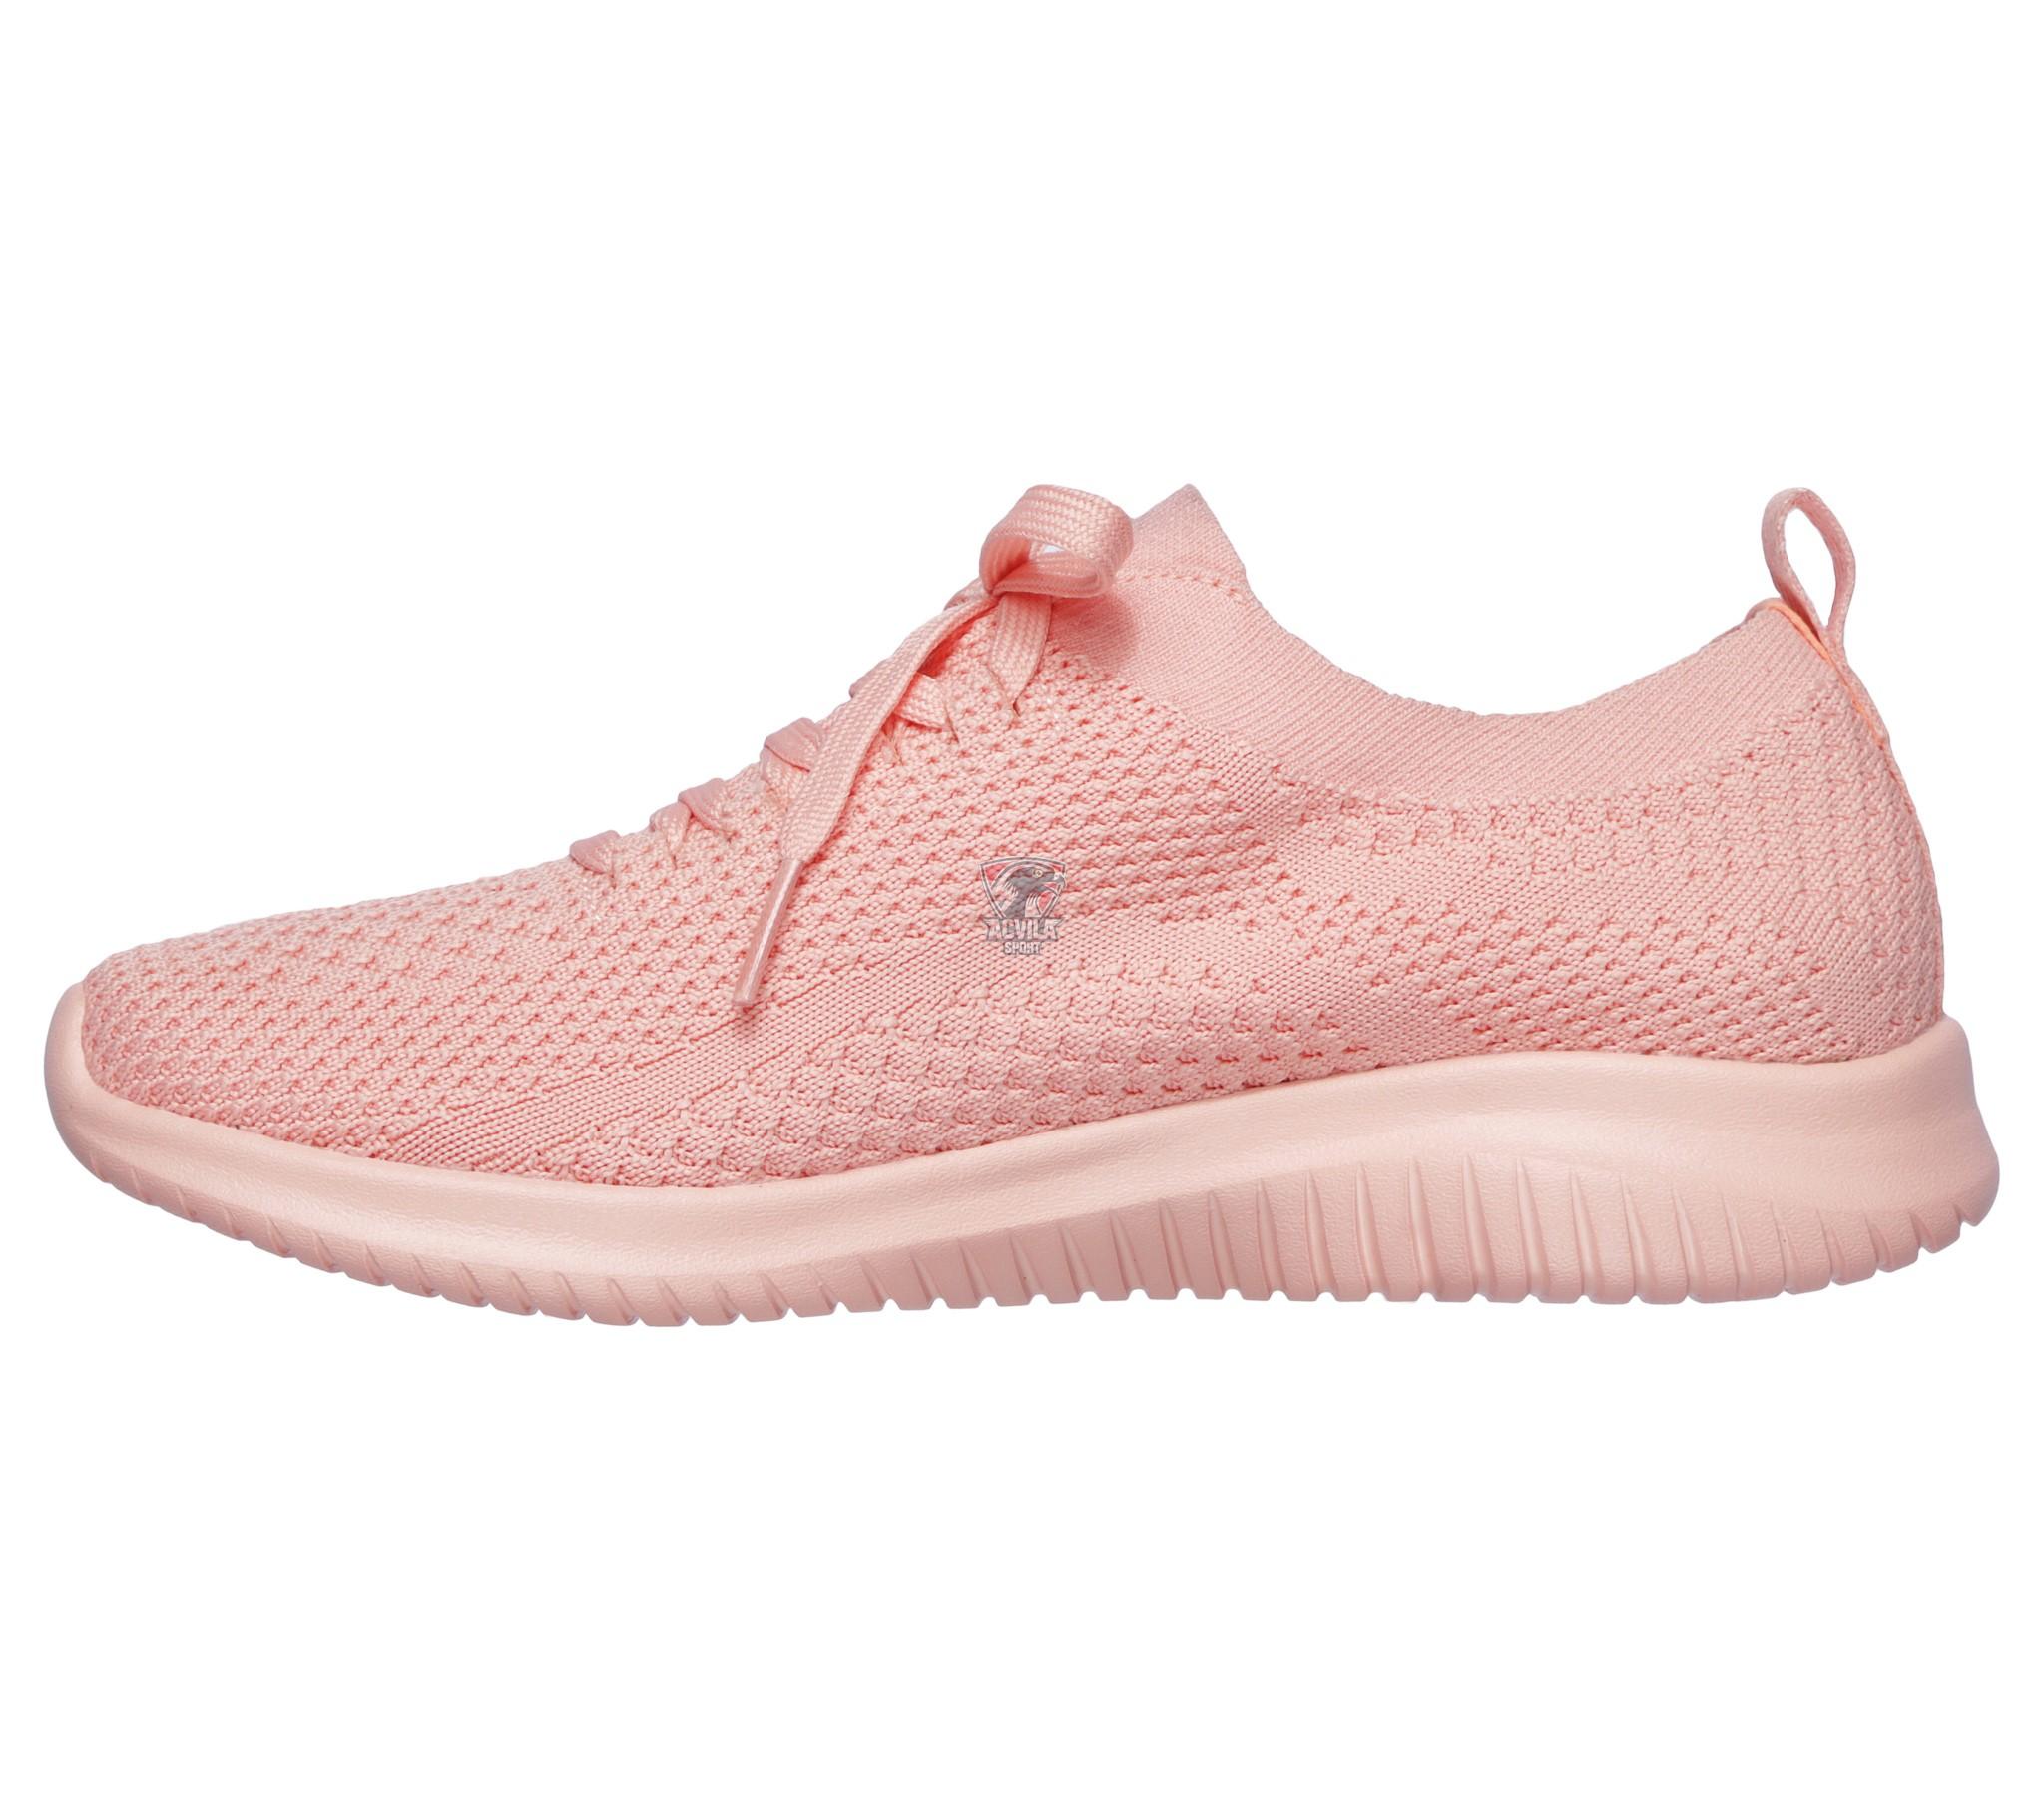 photo 7 Спортивная обувь SKECHERS ULTRA FLEX PASTEL PARTY